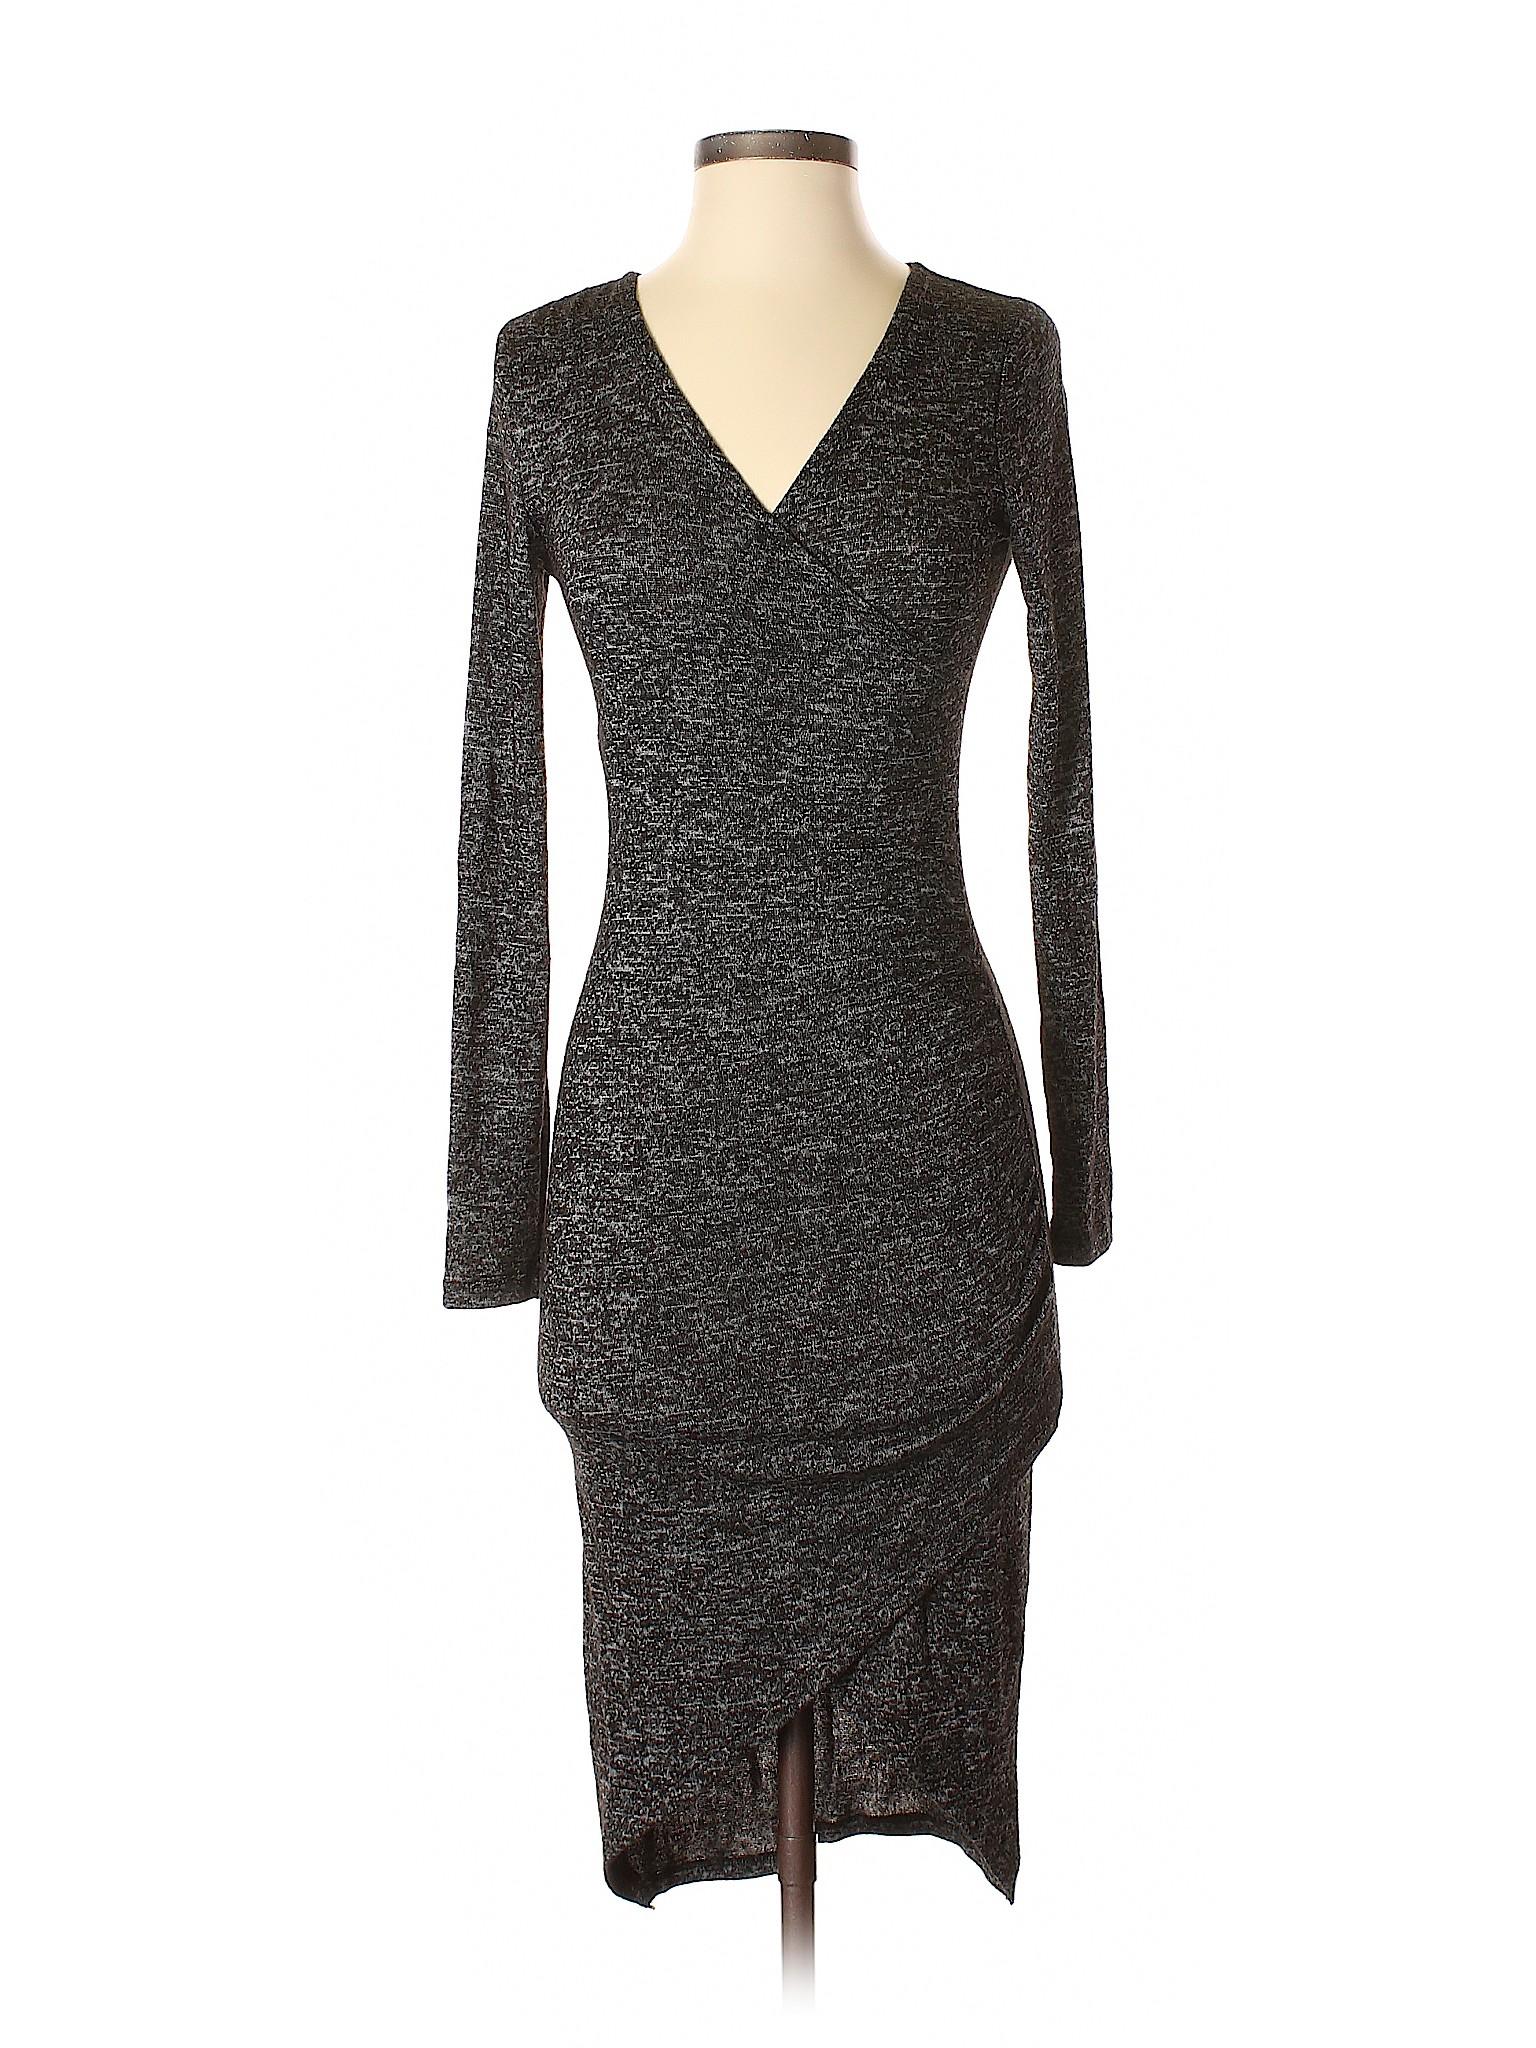 Boutique winter winter Boutique Trendyland Dress Casual WvwqgO0wP